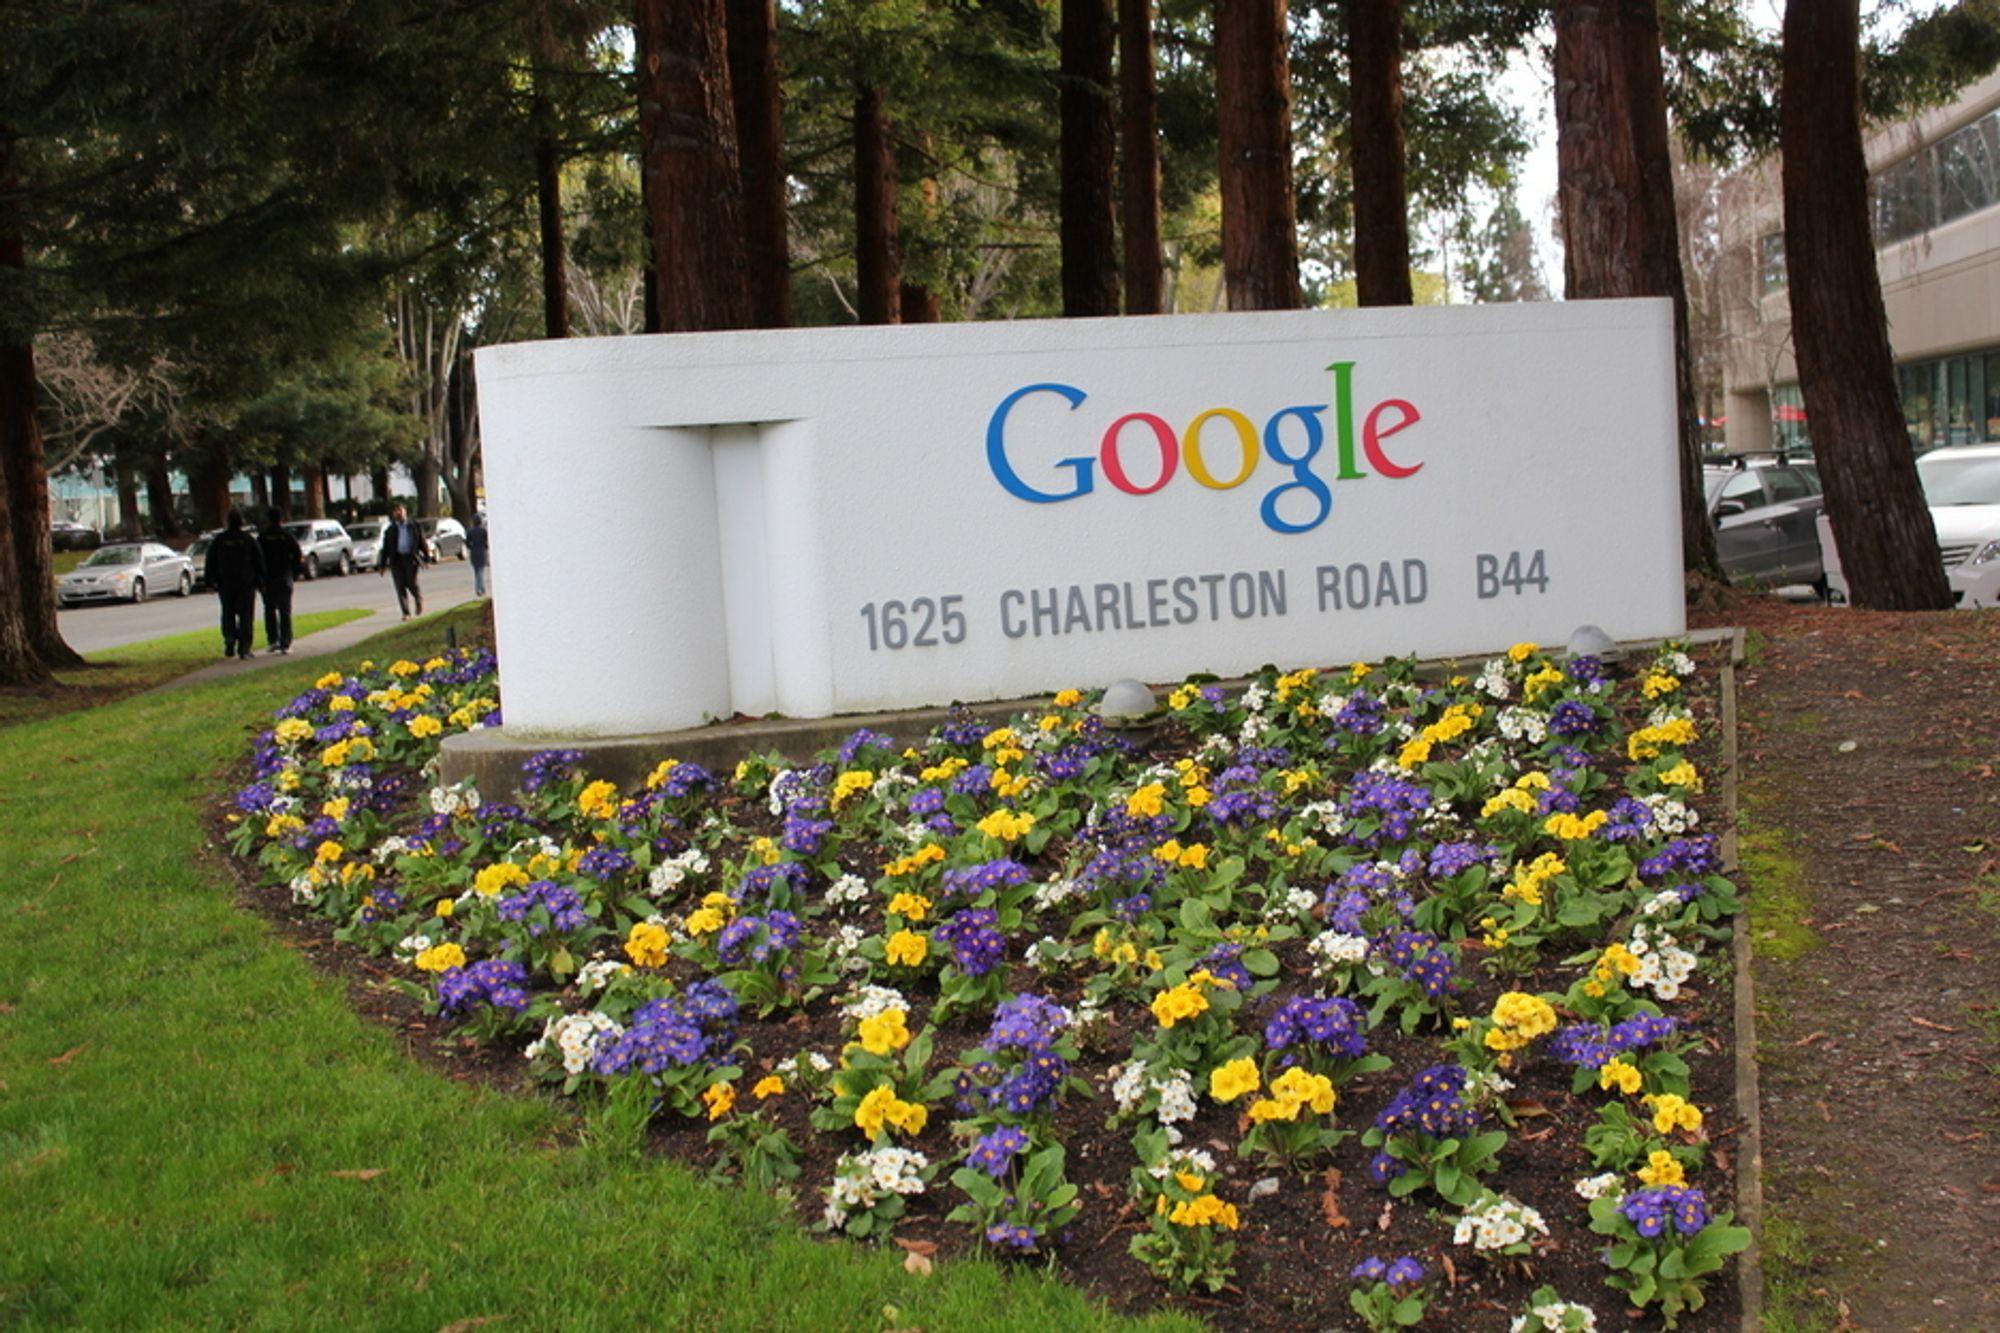 GOOGLEPLEX: Hovedkvarteret til Google rommer over 8000 ansatte over flere kvartaler.